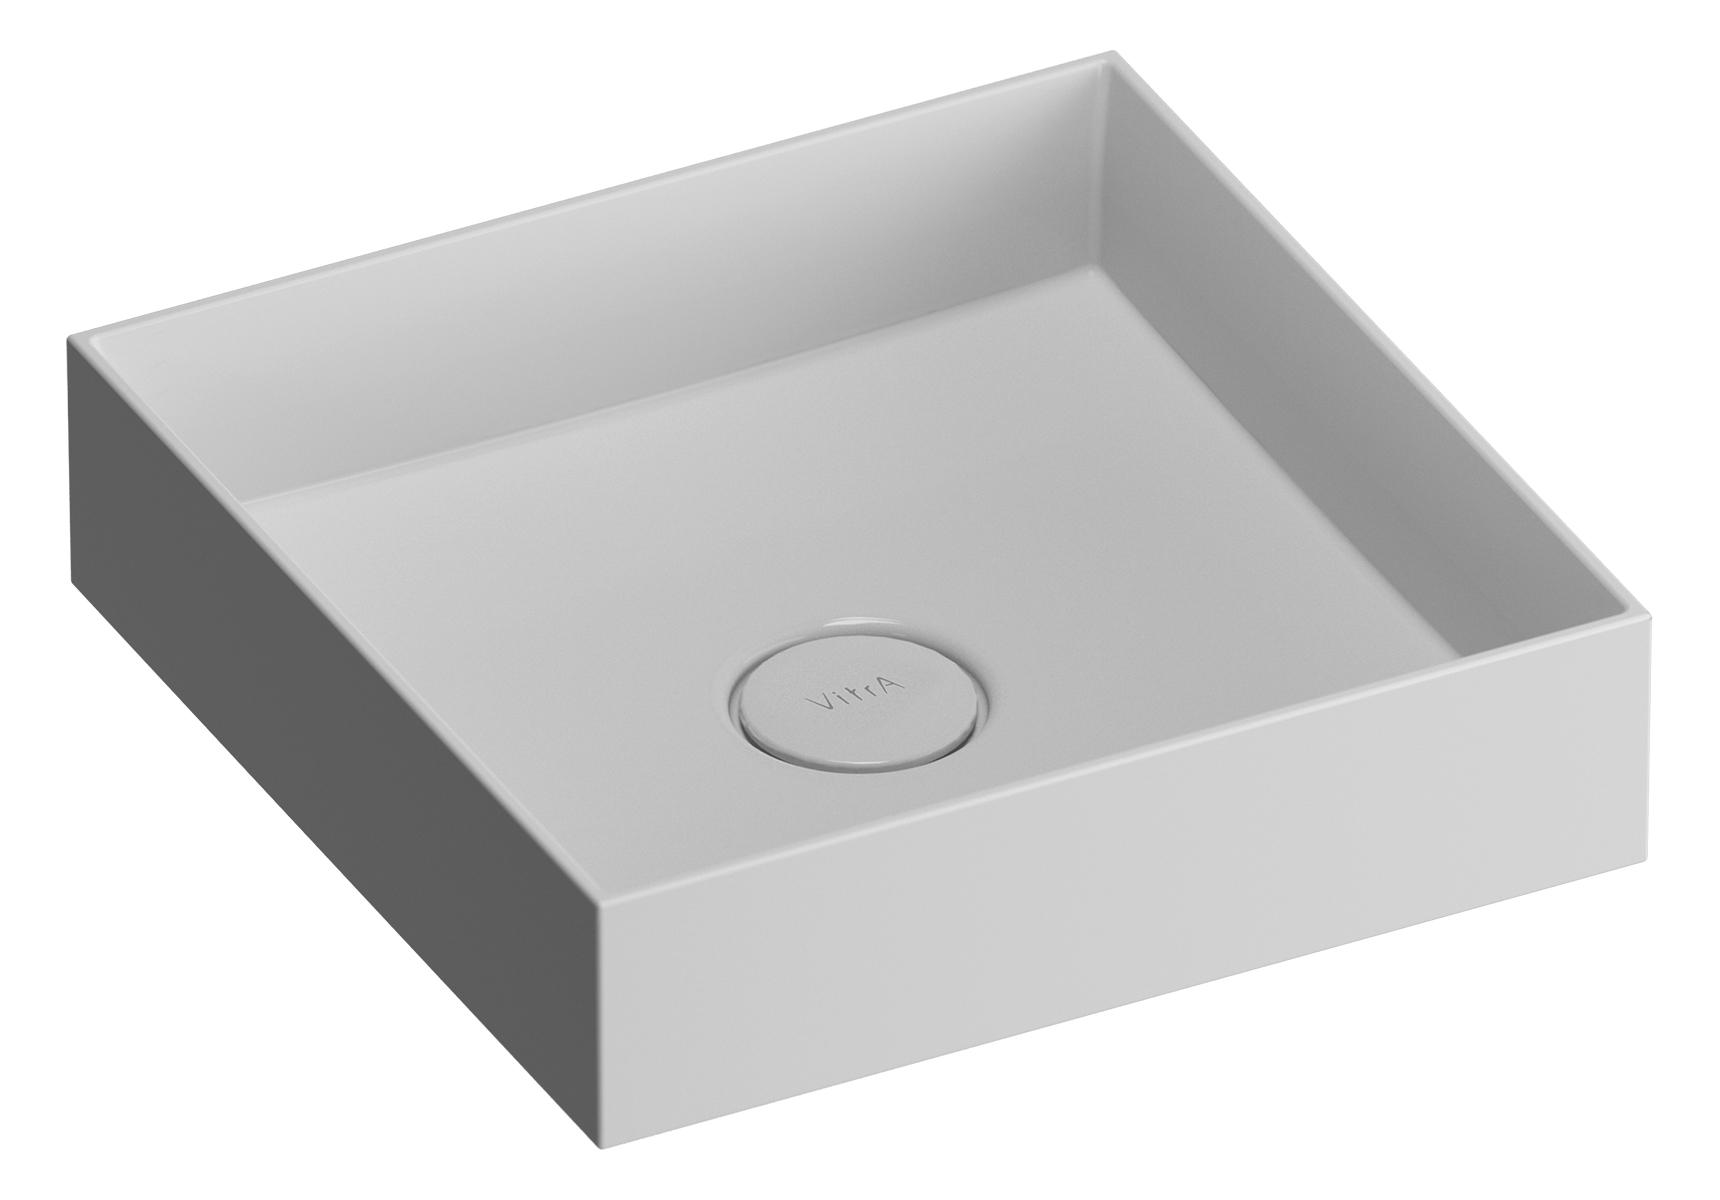 Memoria Aufsatzschale Mineralguss, quadratisch, 40 cm